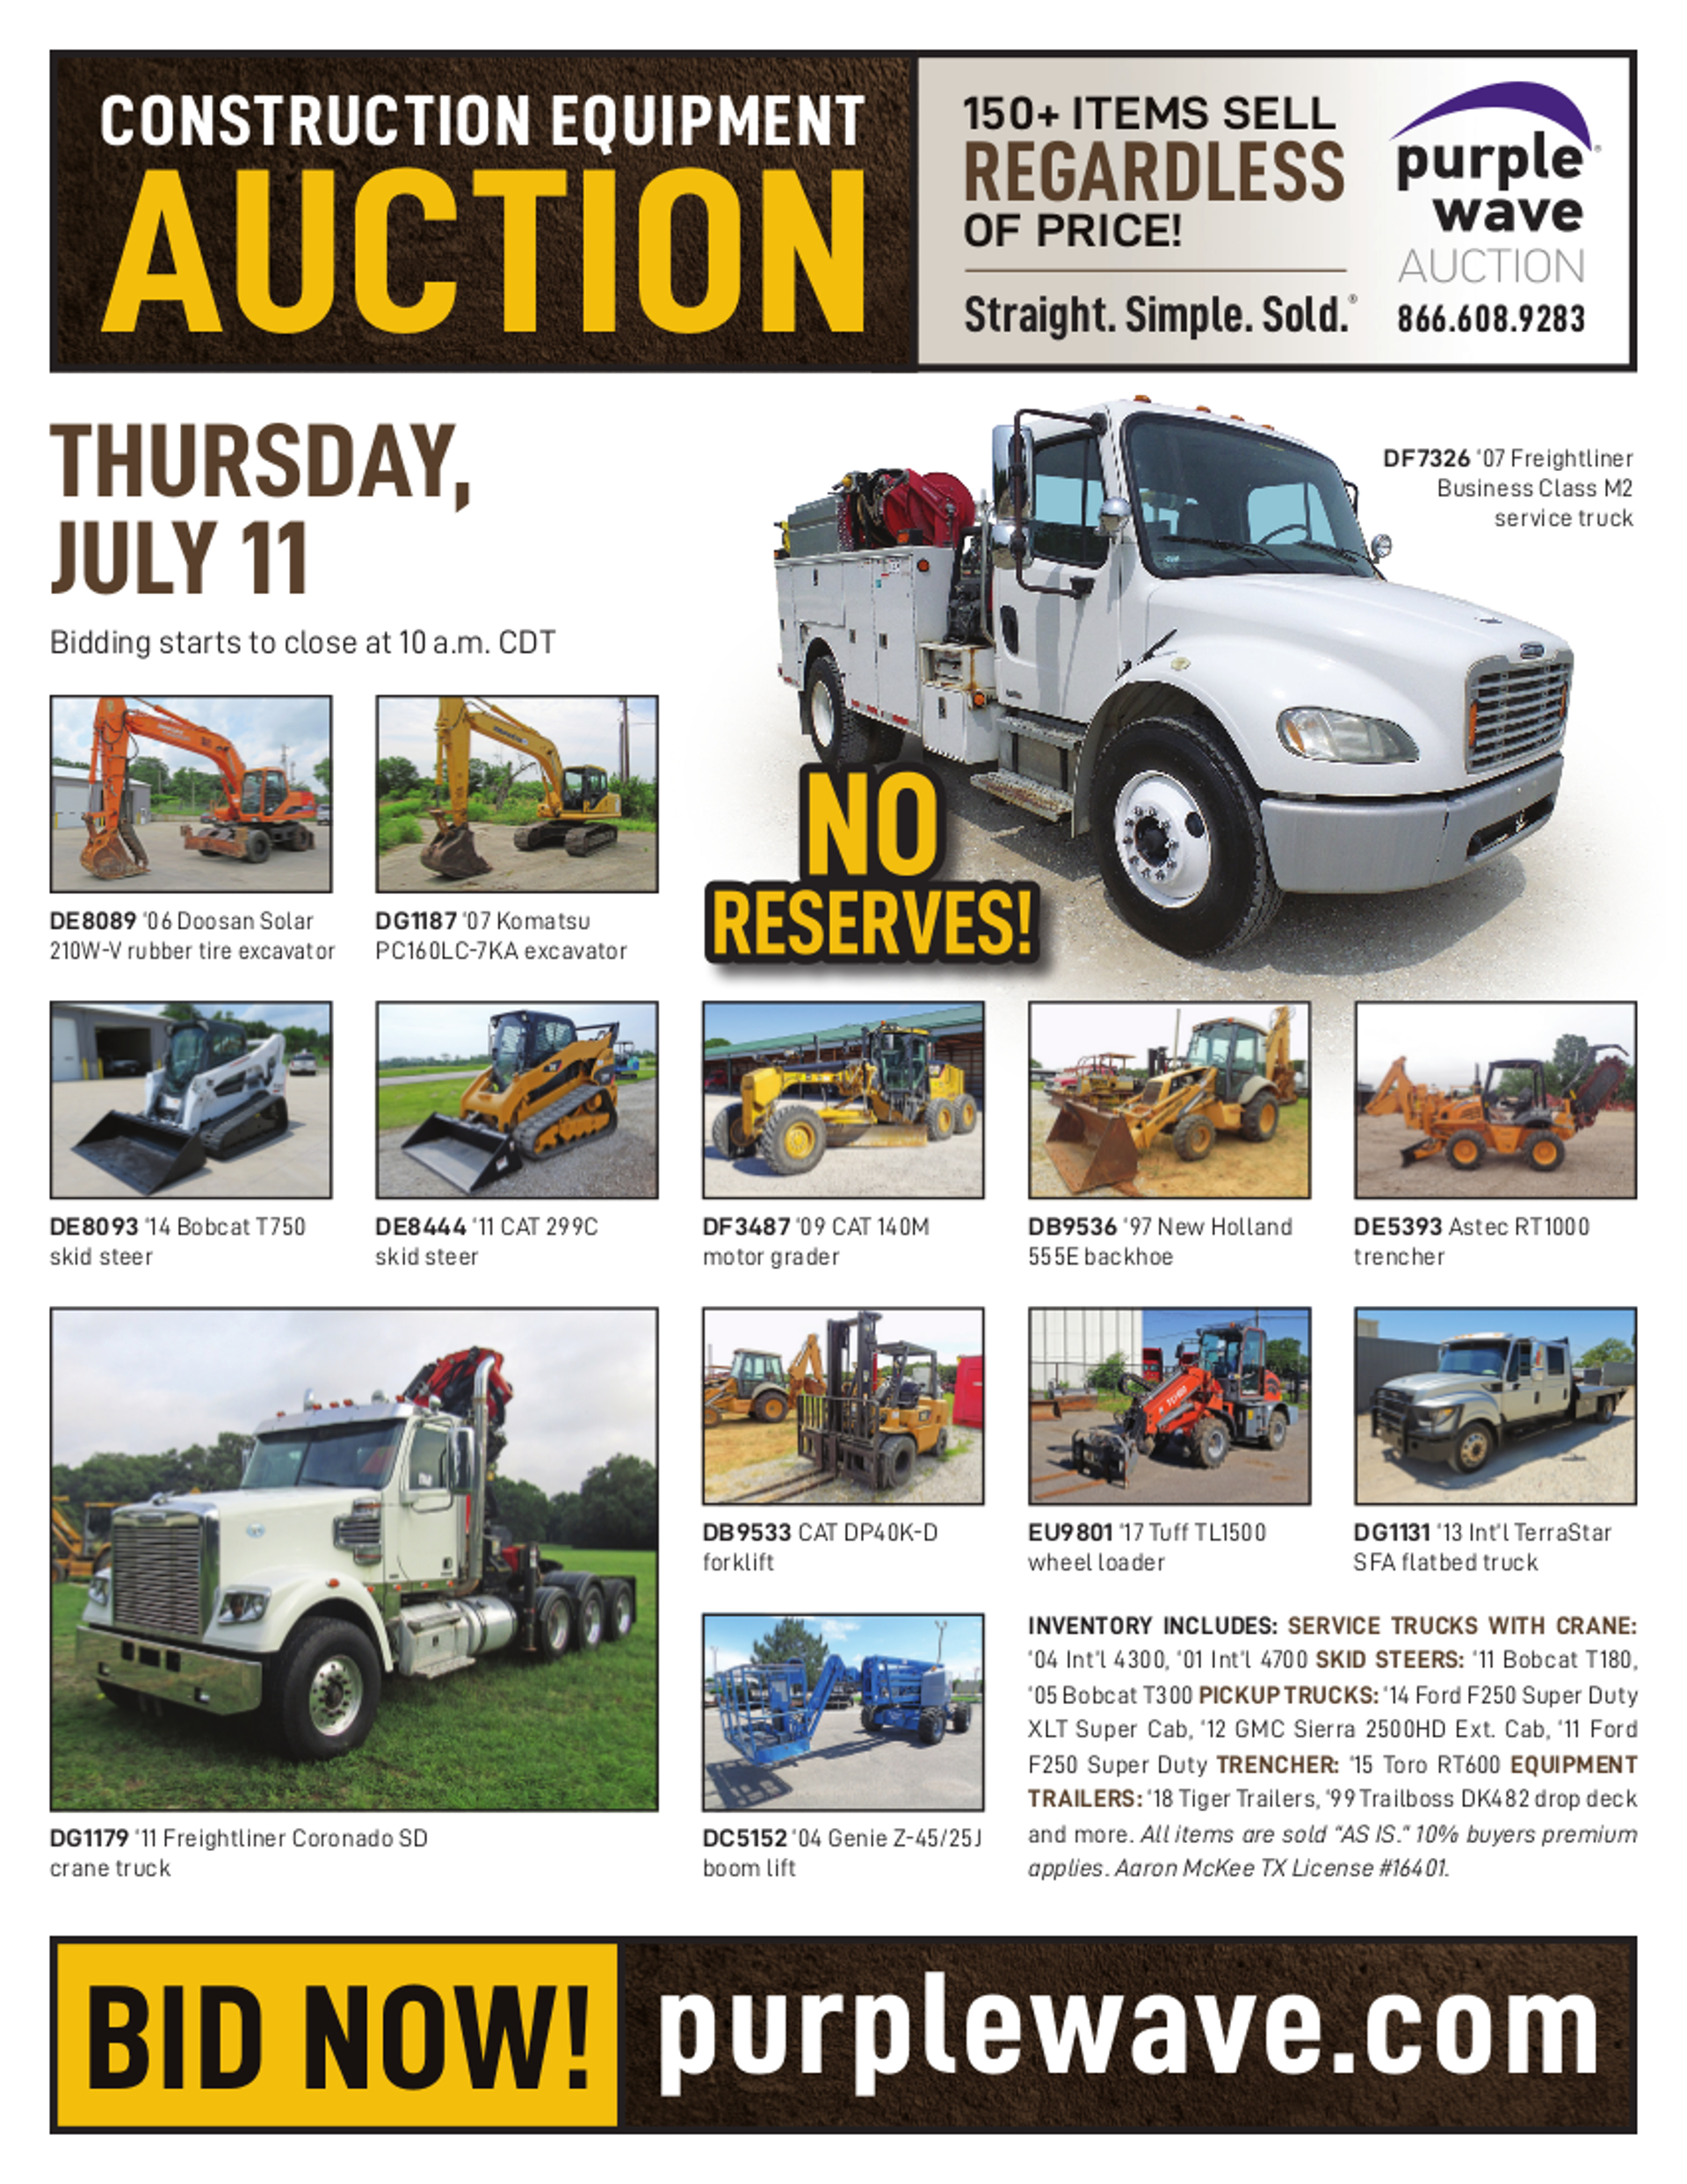 SOLD! July 11 Construction Equipment Auction | PurpleWave, Inc